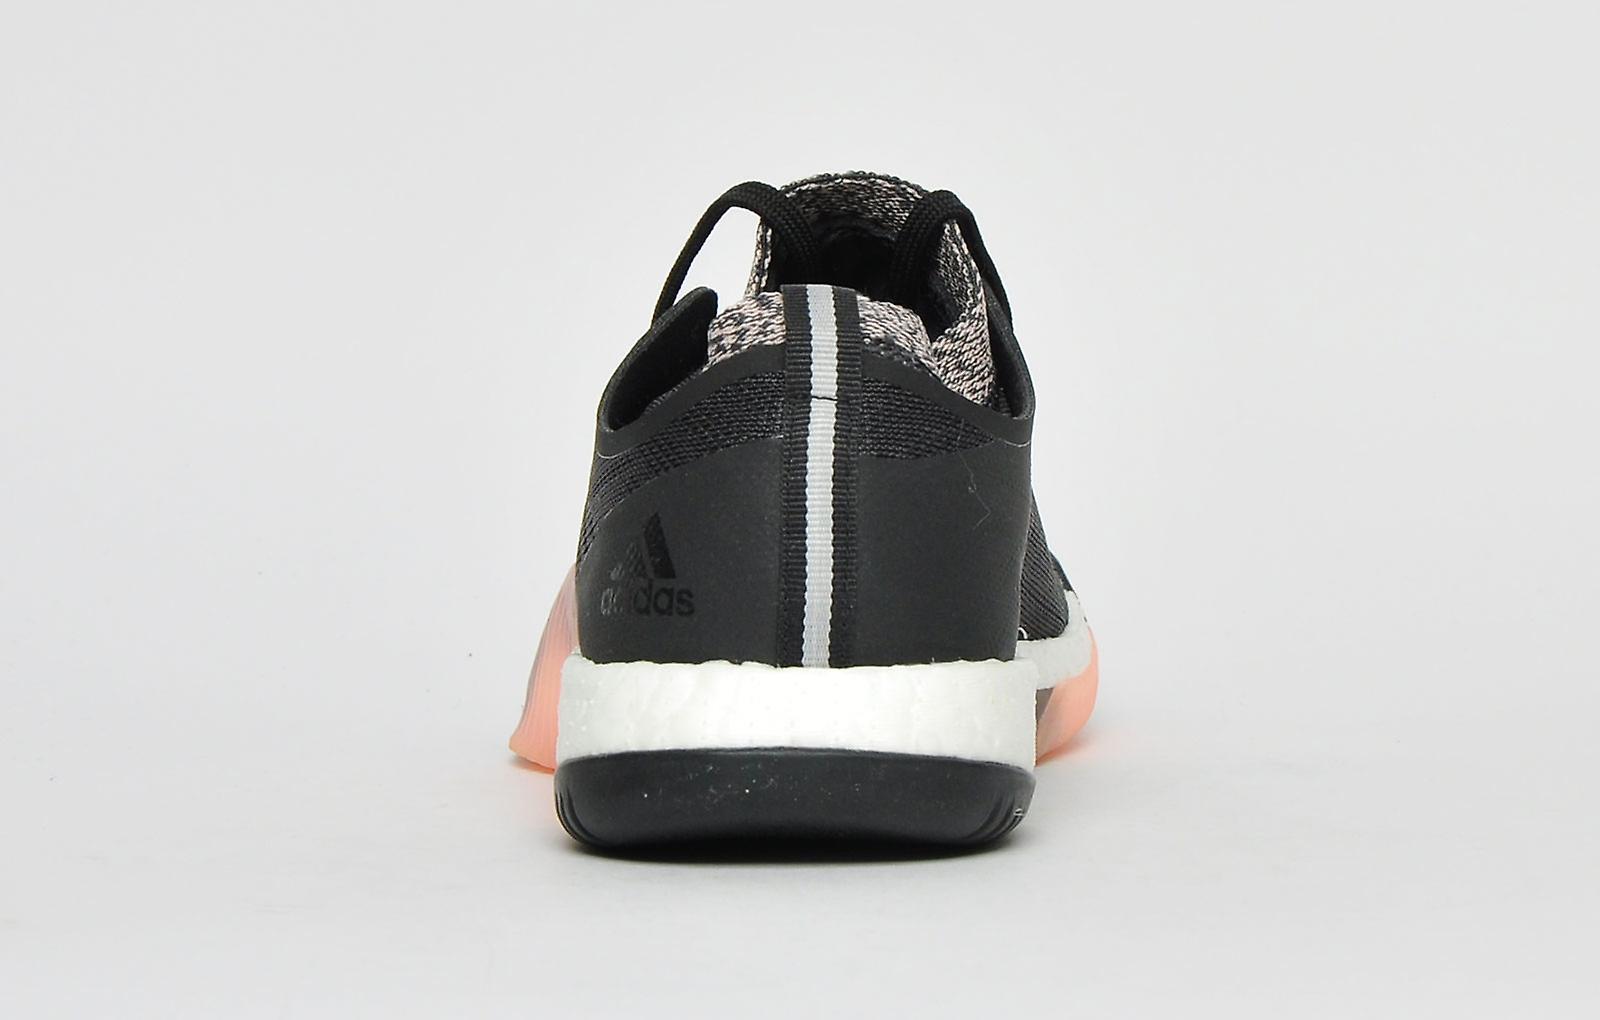 Adidas CrazyTrain Elite Boost Svart / Hvit / Rosa